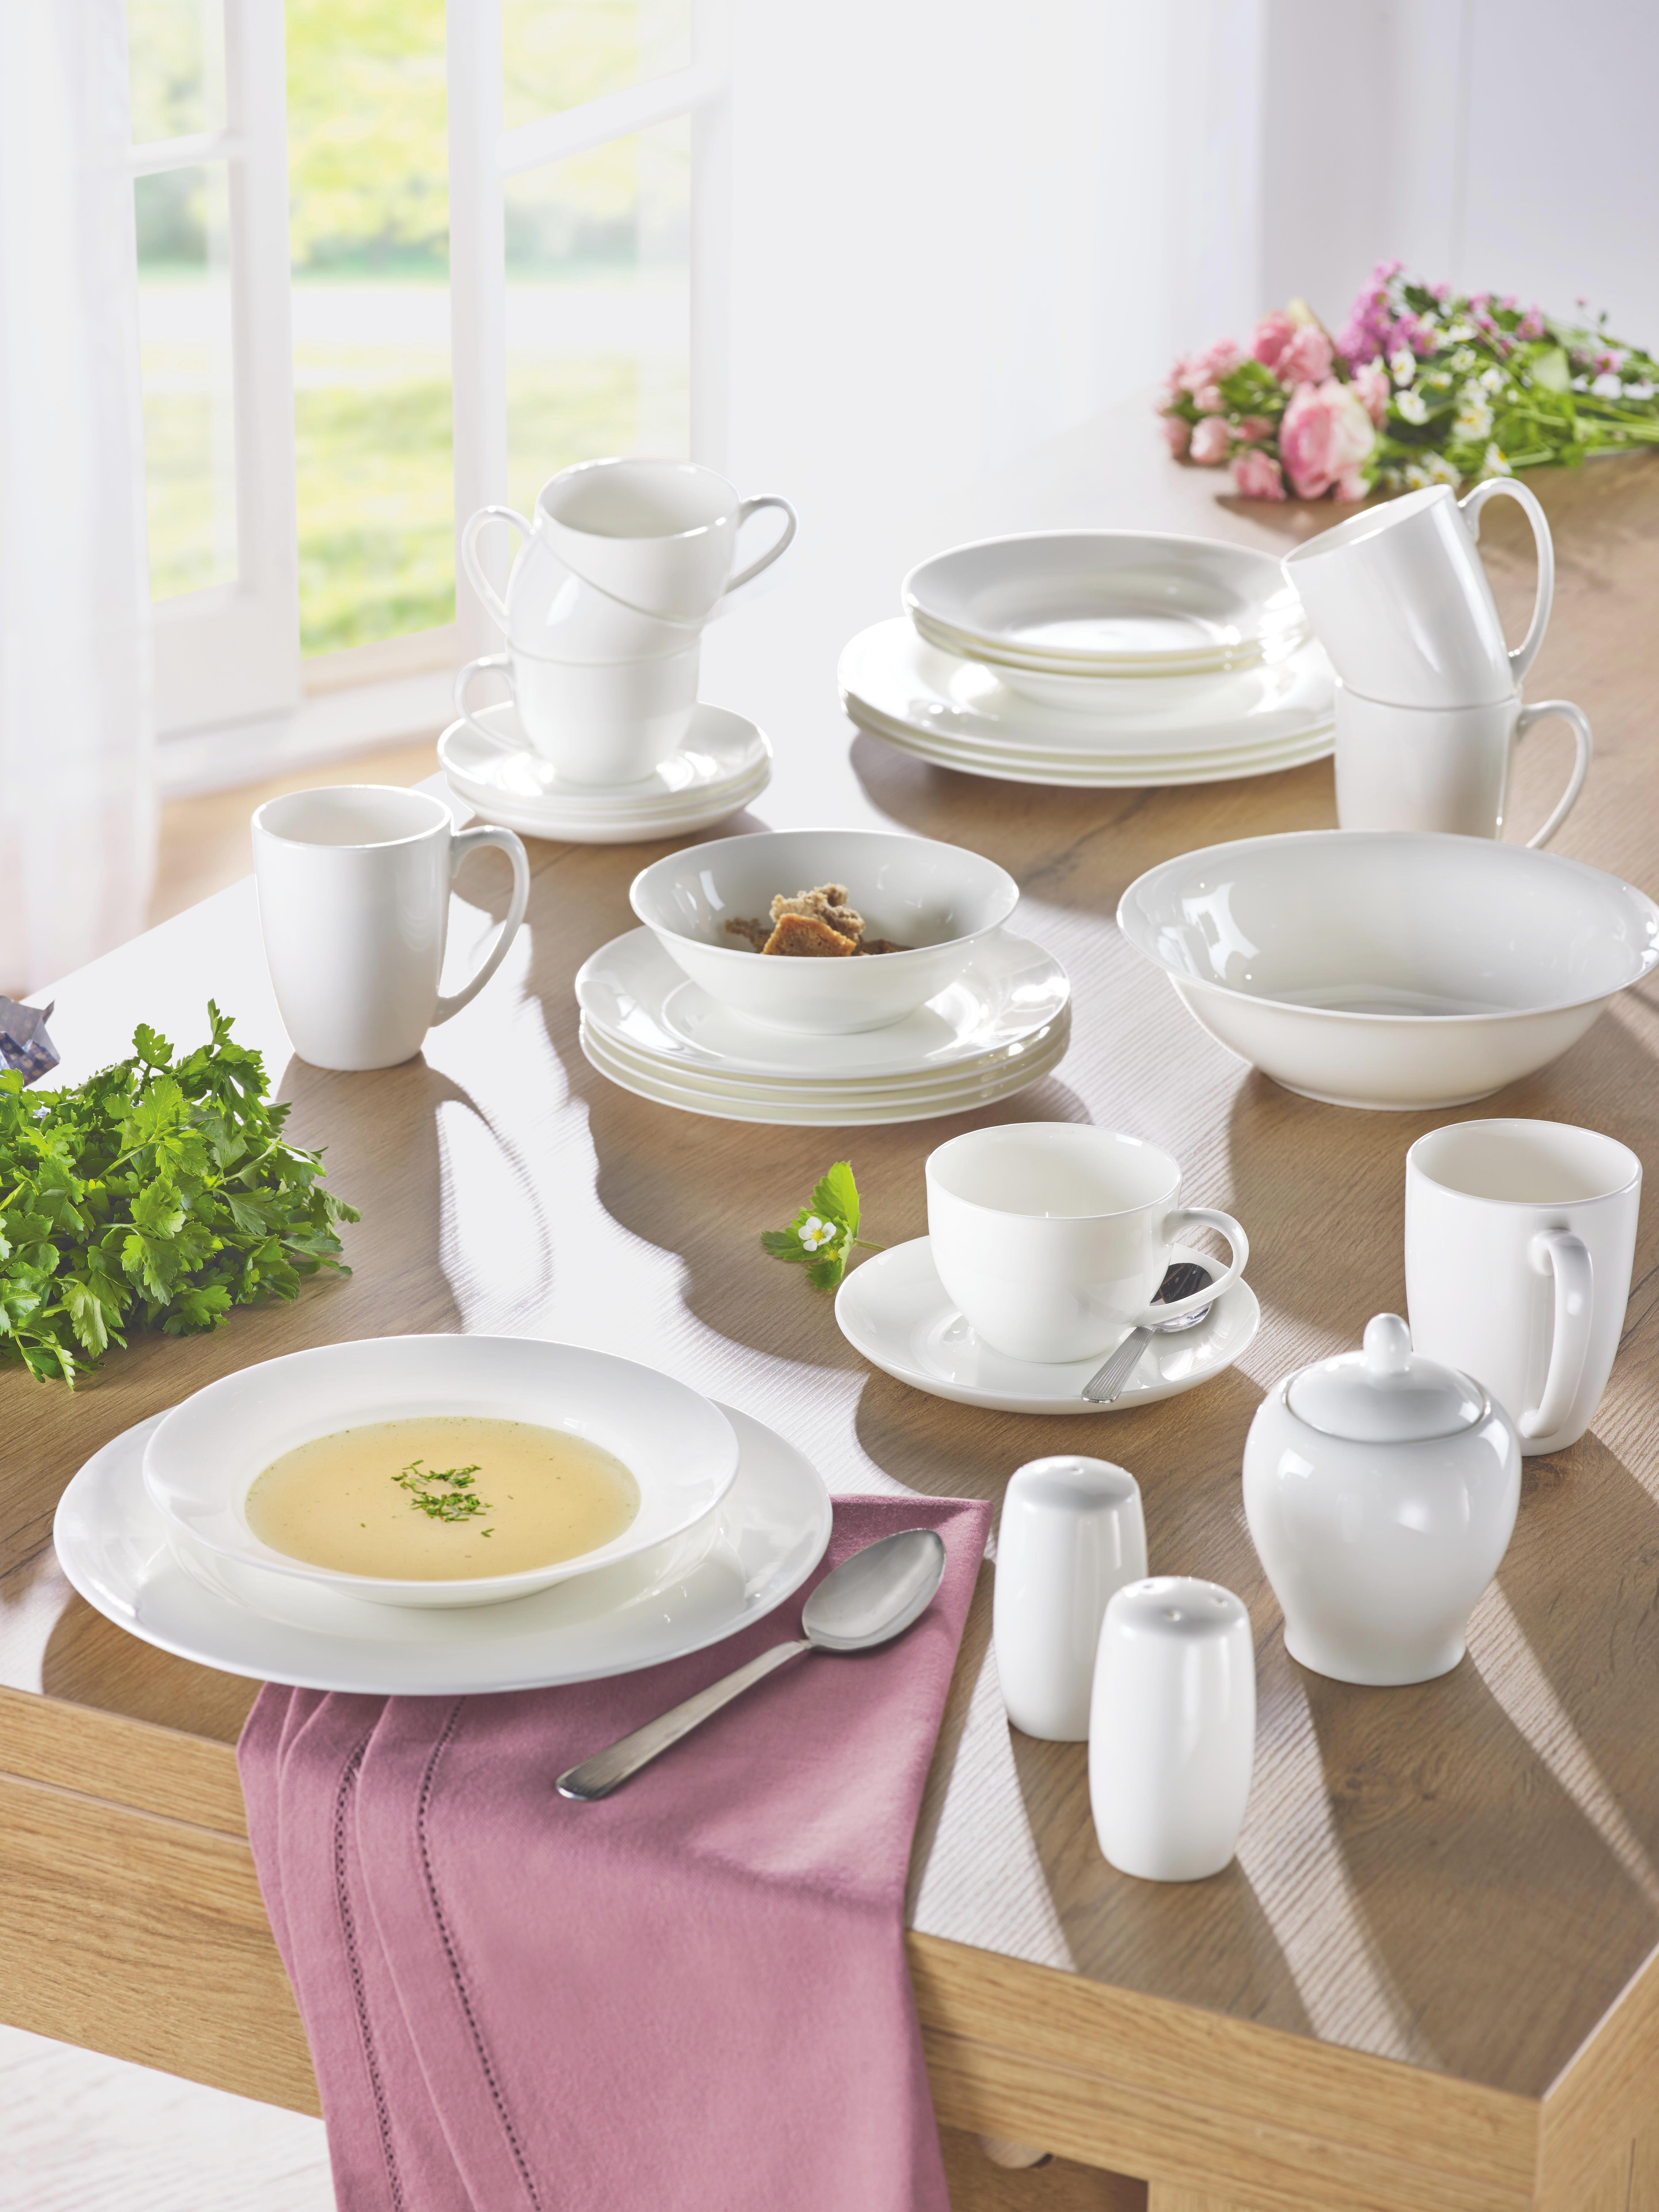 Kaffeetasse mit Untertasse Bonnie in Weiß - Weiß, MODERN, Keramik (0,28l) - MÖMAX modern living